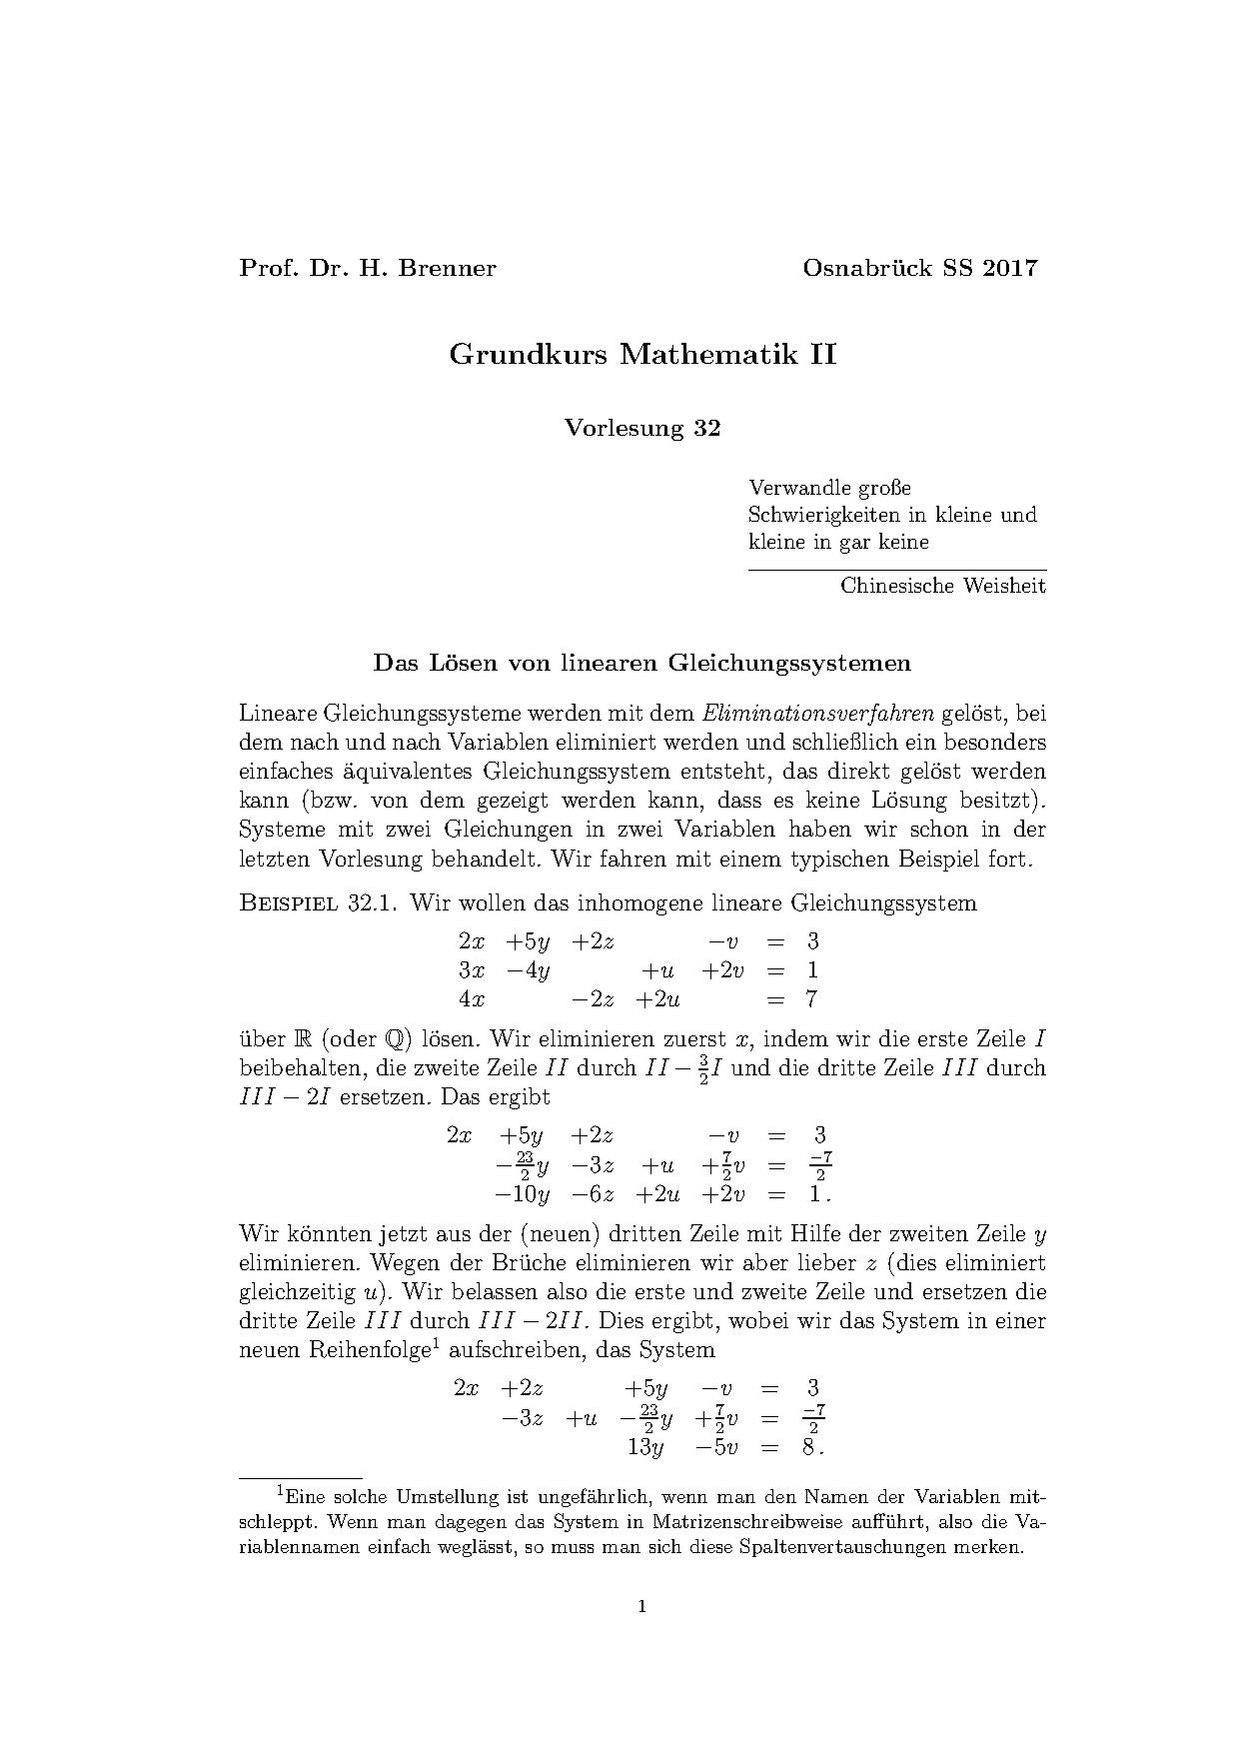 Snap Atemberaubend Diamant Mathematische Probleme Arbeitsblatt Fotos ...